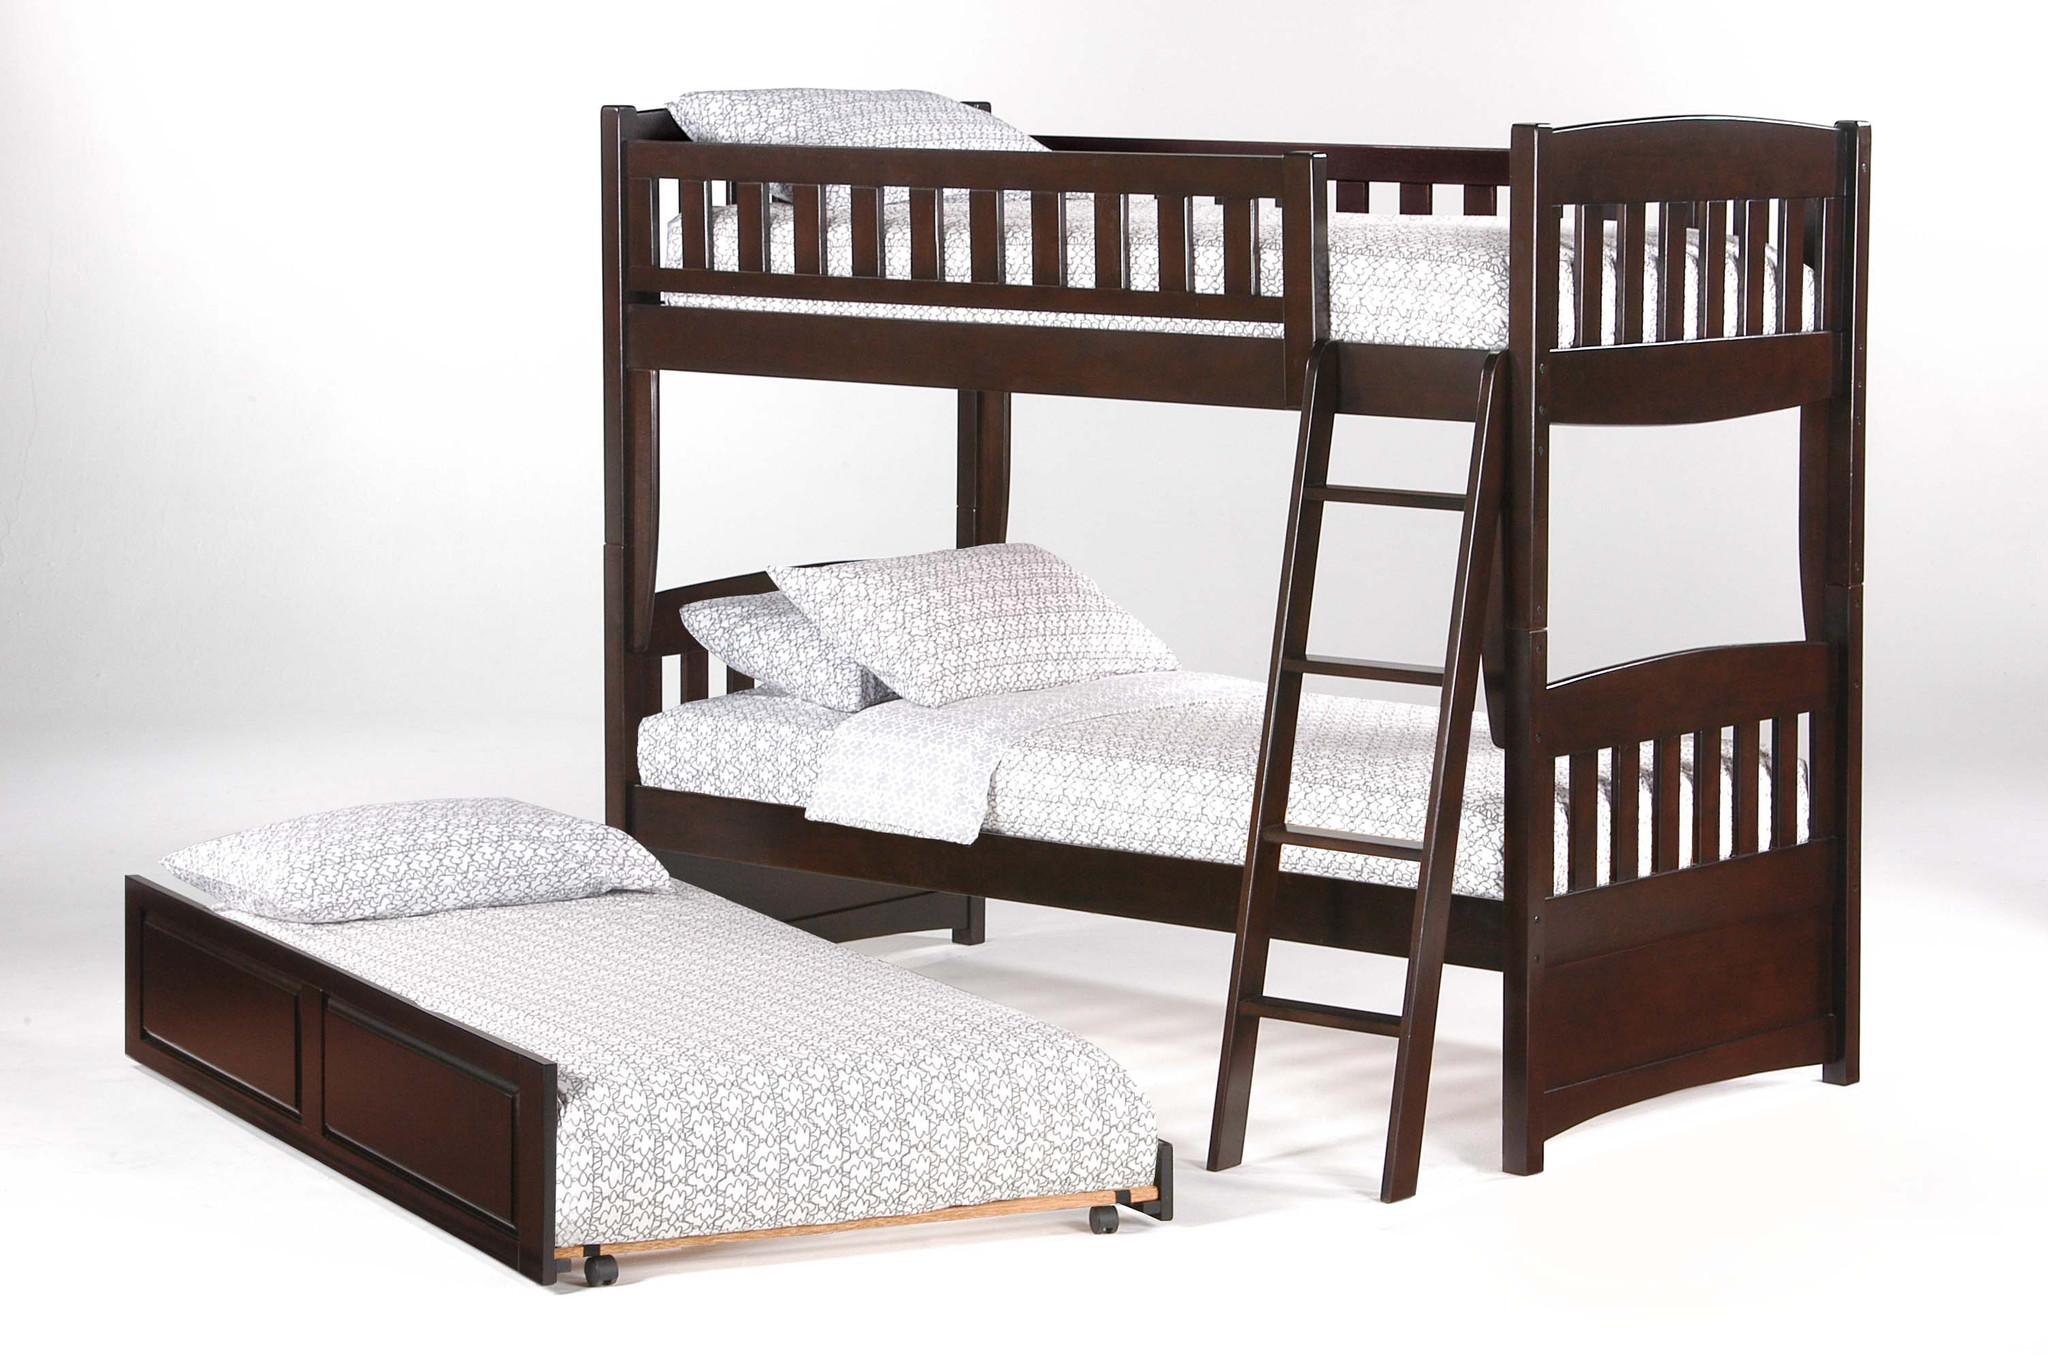 Twin Bunk Bed Mattress 2048 x 1362